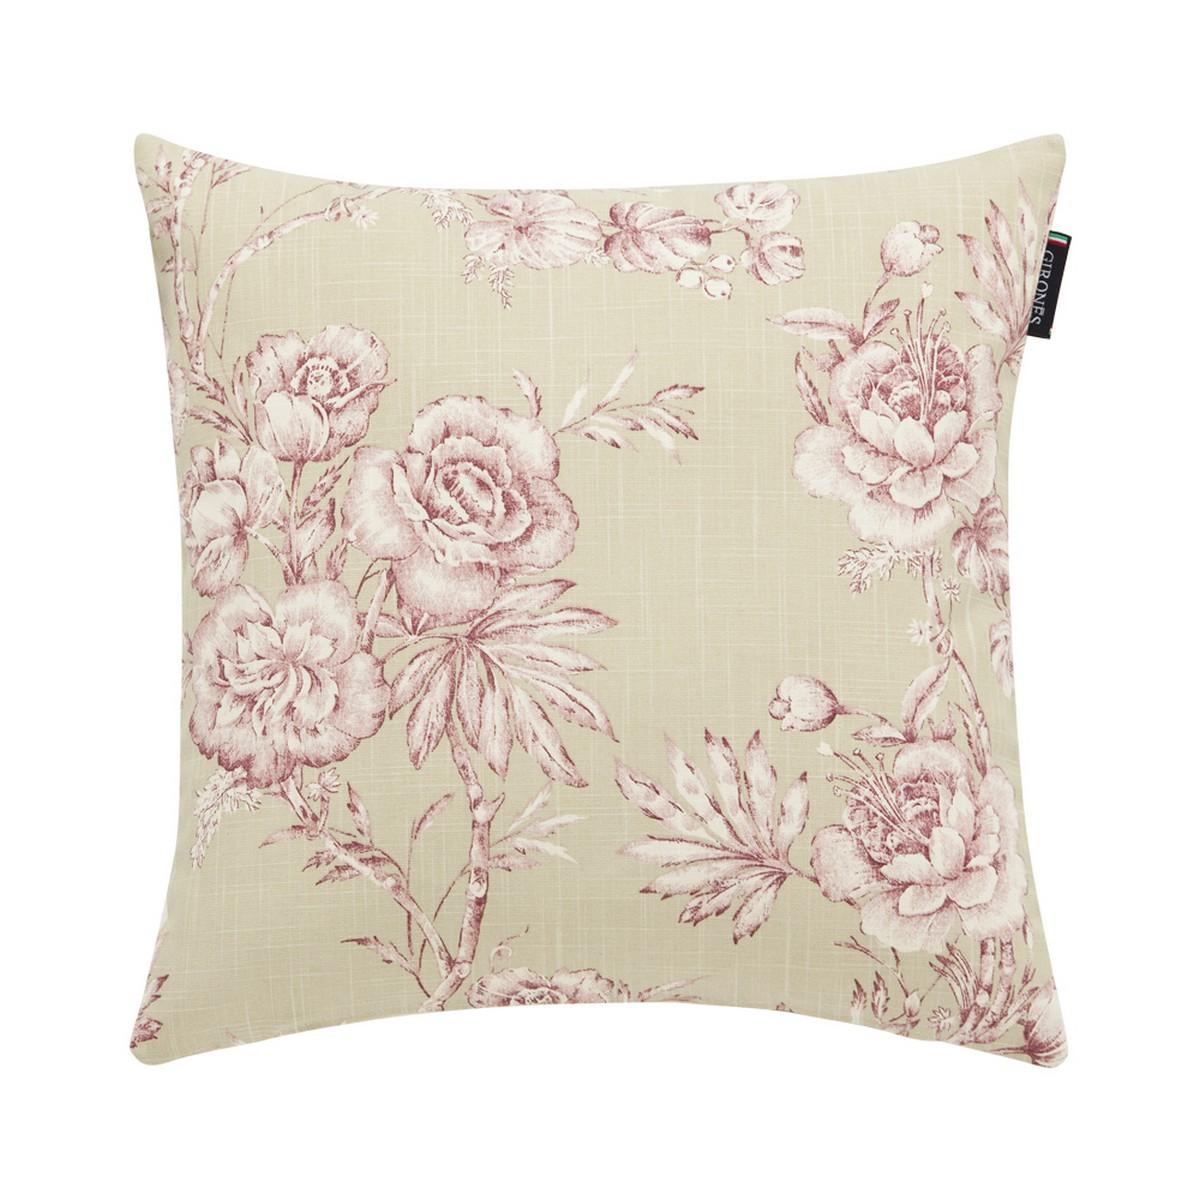 Rose flower beige pink cushion cover rose flower beige pink cushion cover mightylinksfo